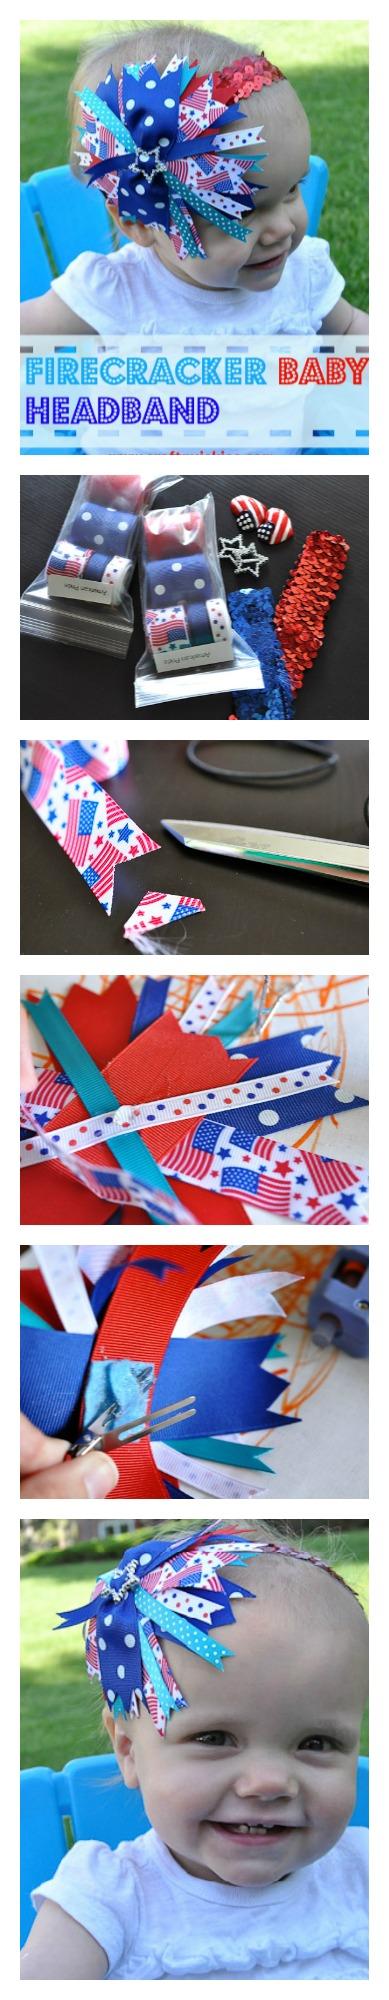 Firecracker Baby Headband Collage